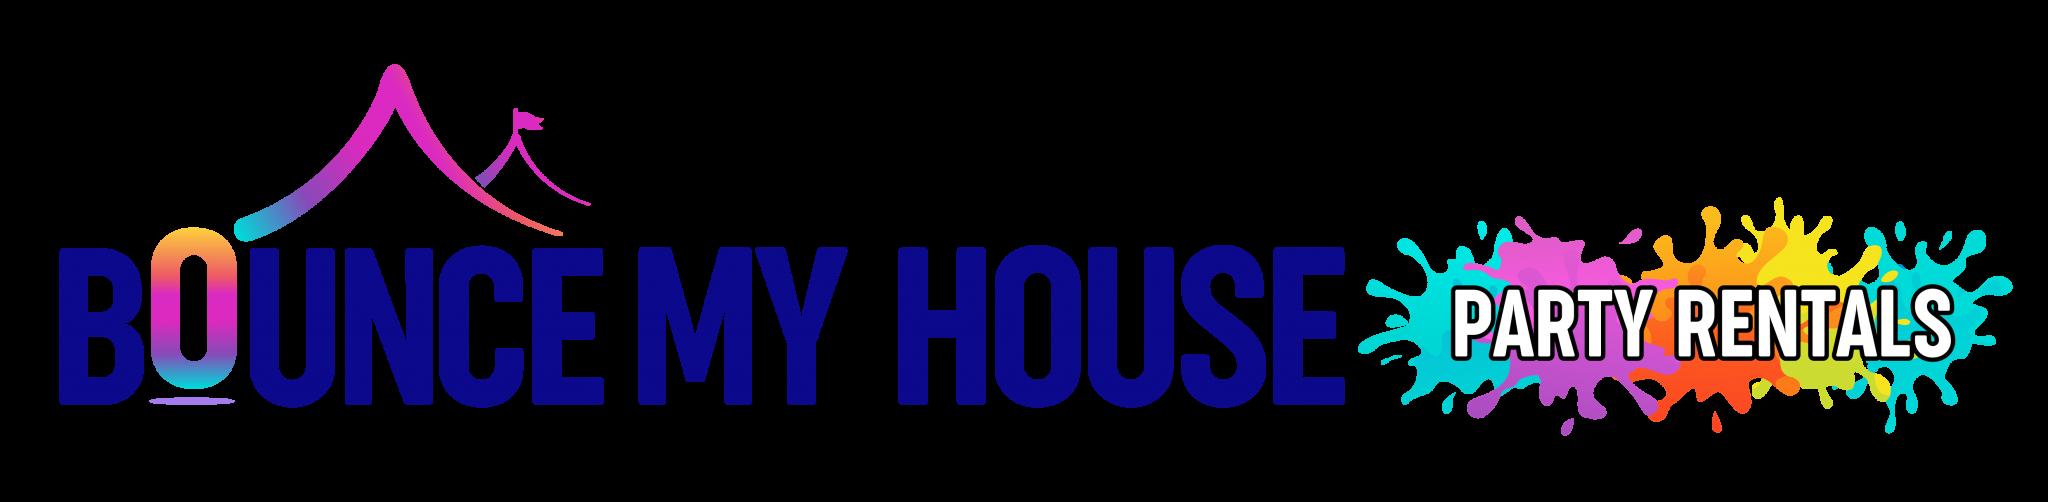 Bounce House & Party Rentals   BounceMyHouse.com Oak Lawn IL.